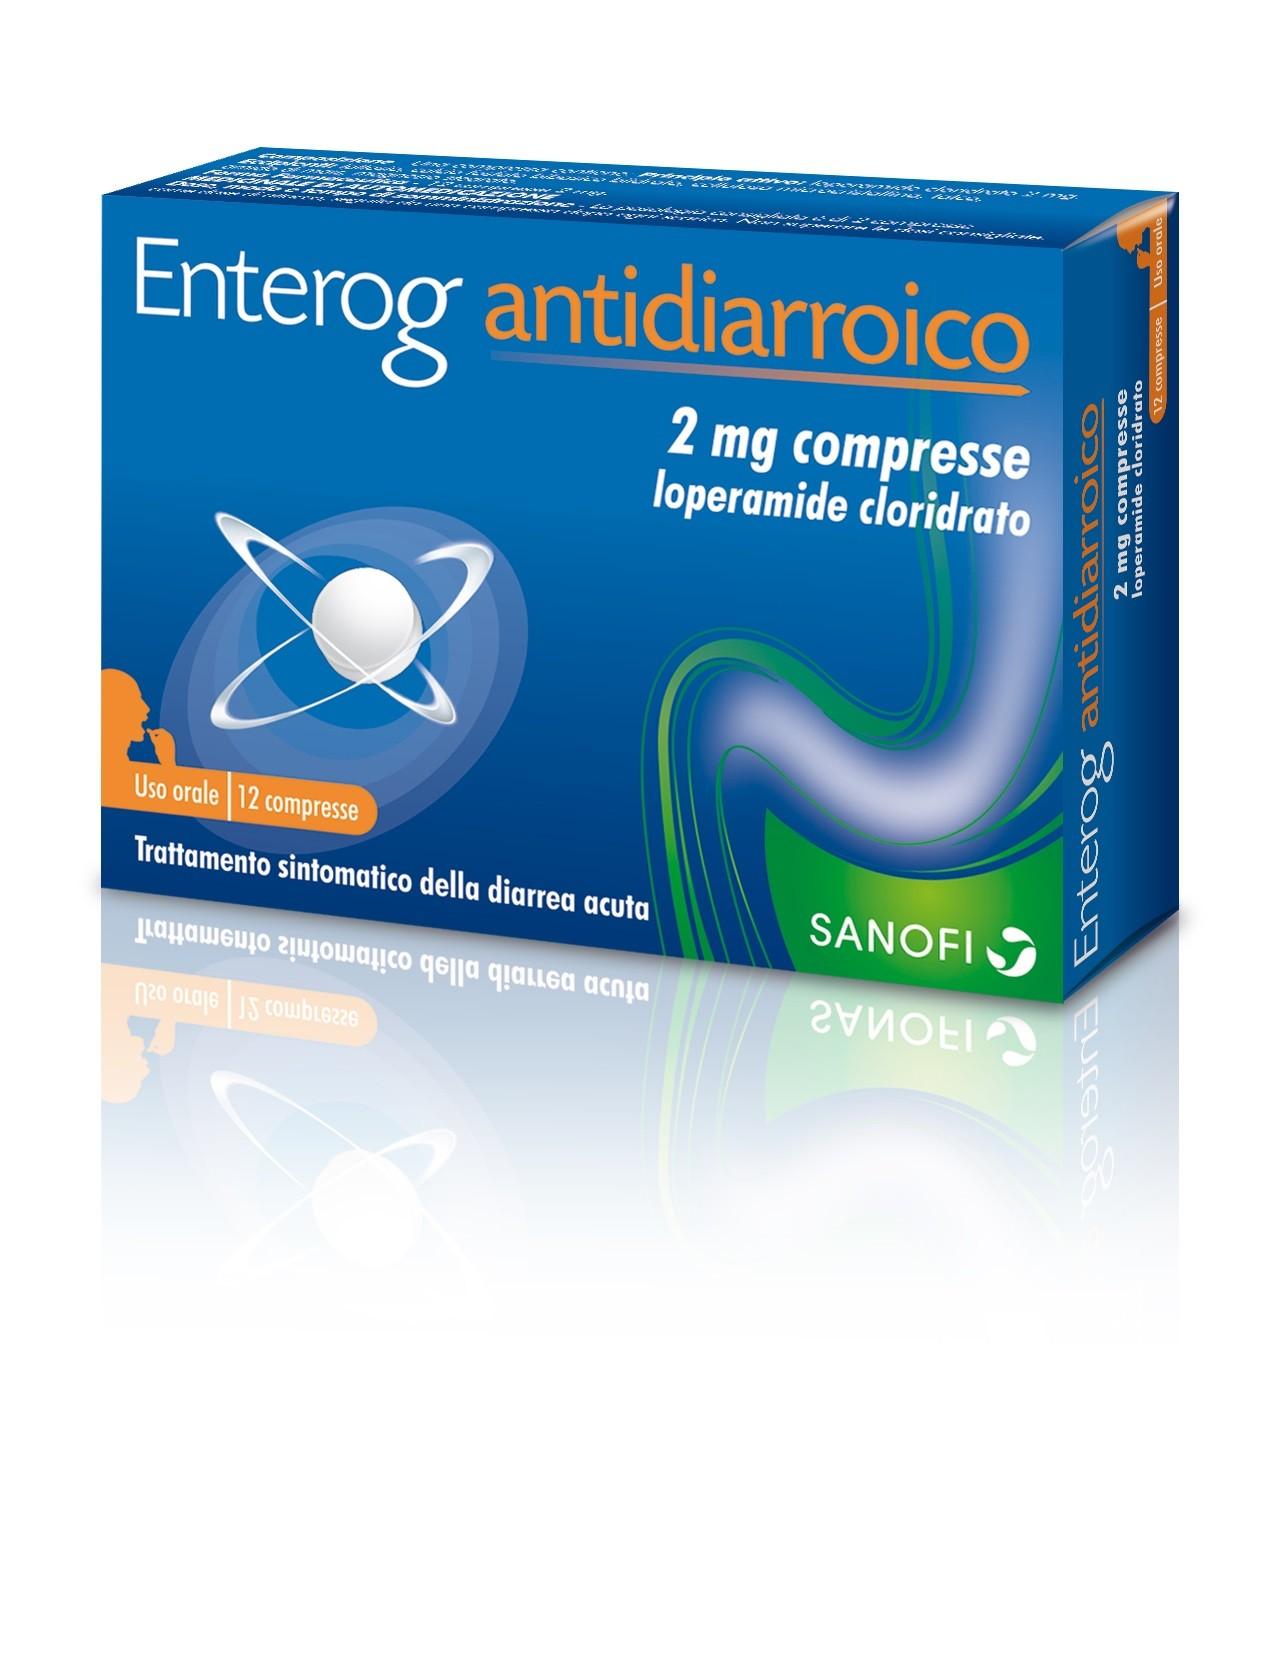 Enterog Antidiarroico 2 Mg Compresse 12 Compresse